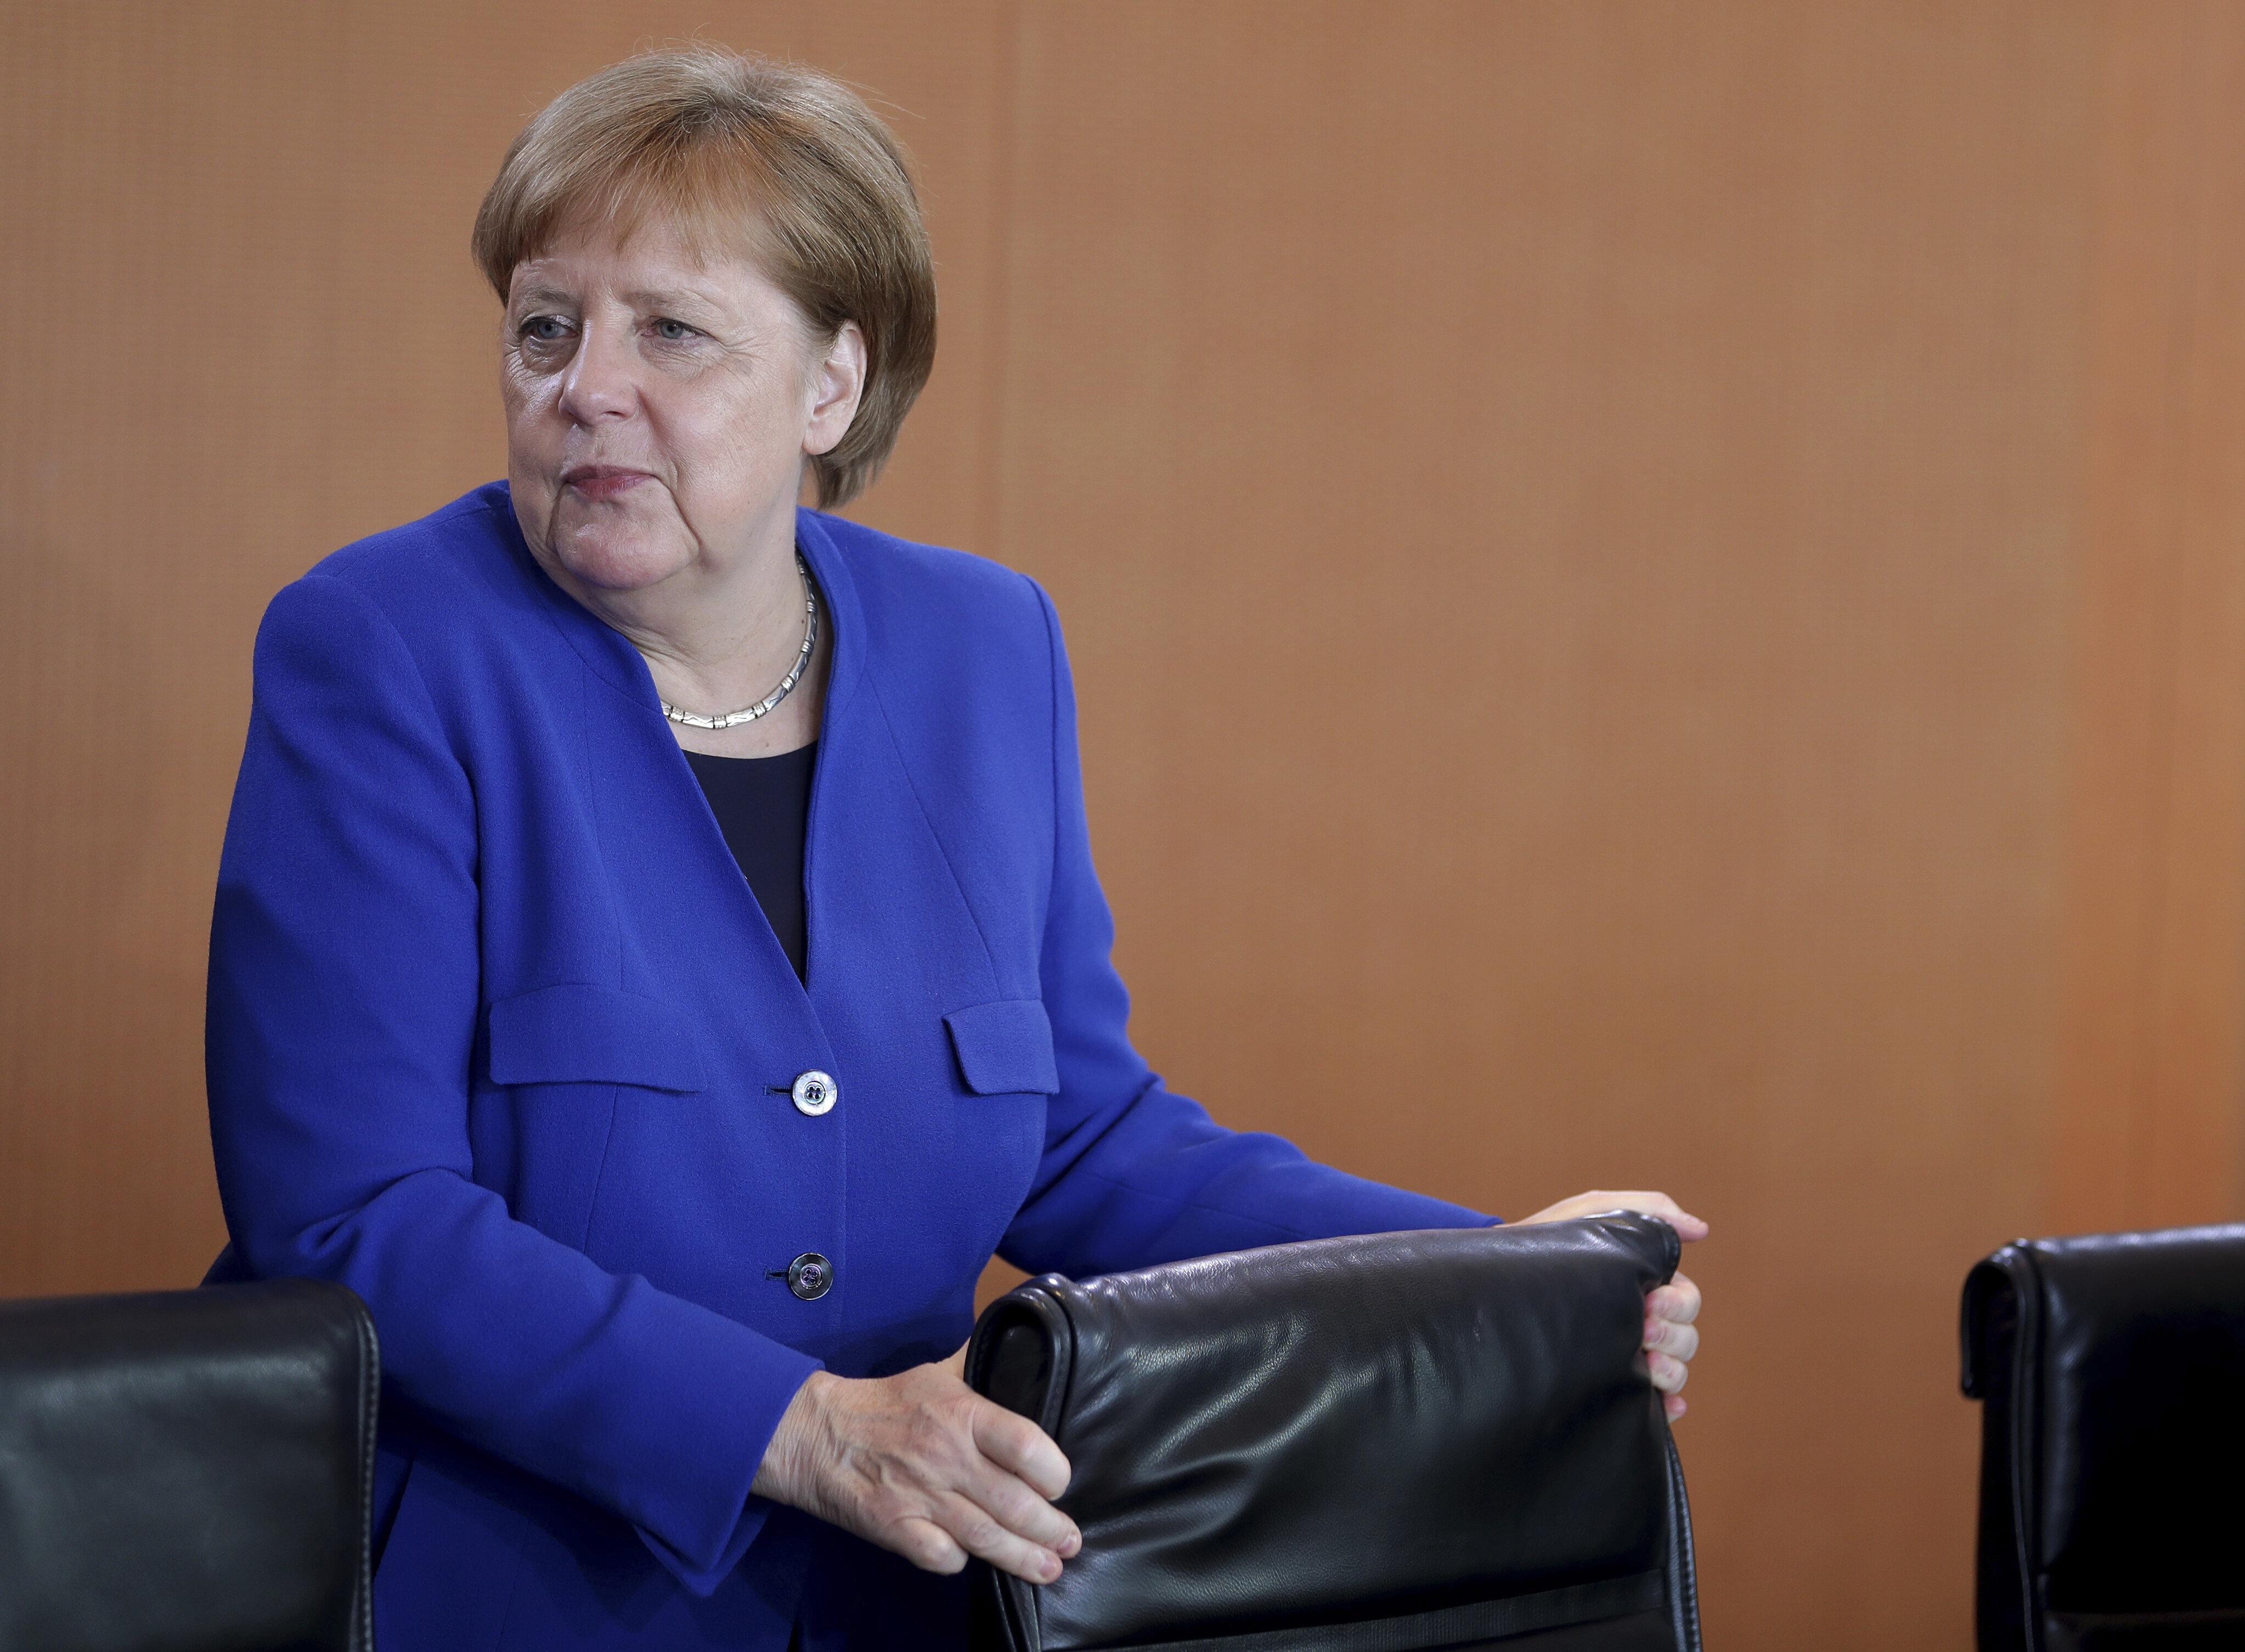 Angela Merkel |   Con Macron ho un rapporto conflittuale  Sostengo Weber ma